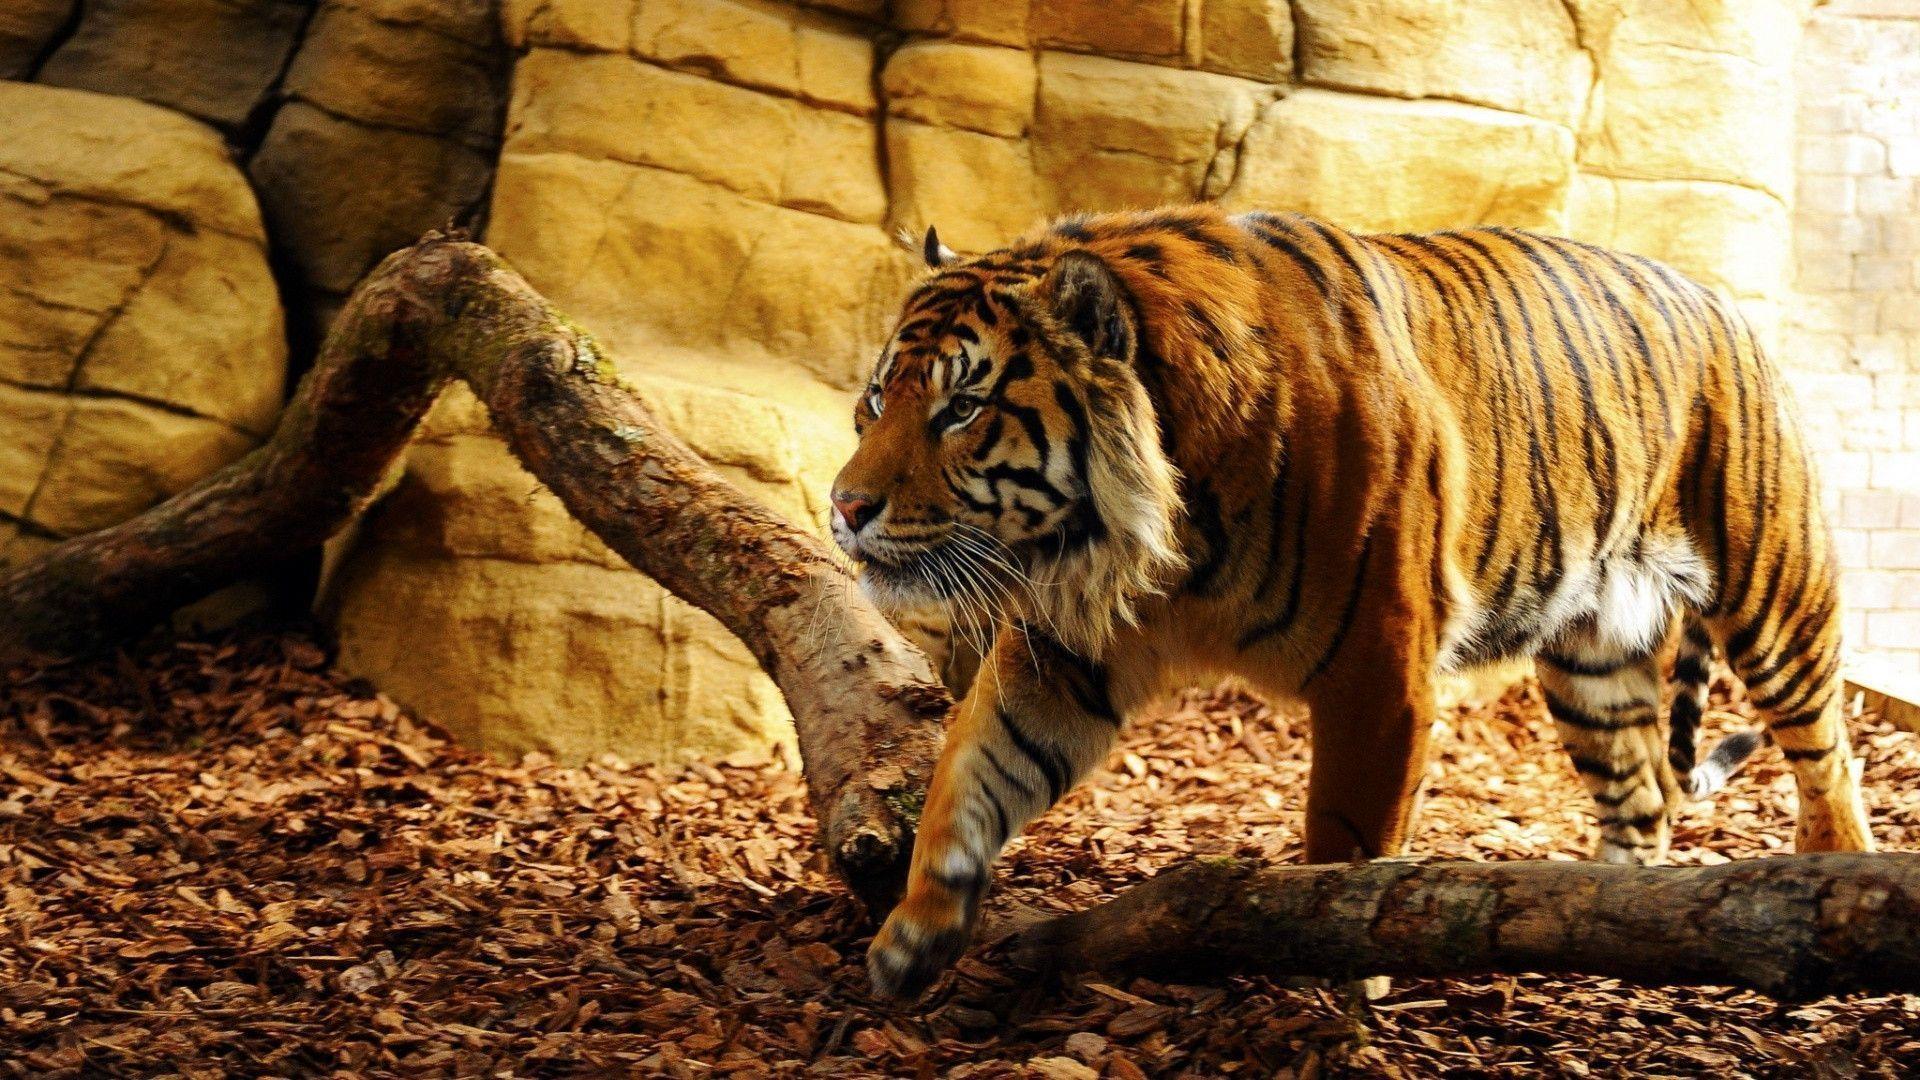 Wonderful Tiger Wallpaper